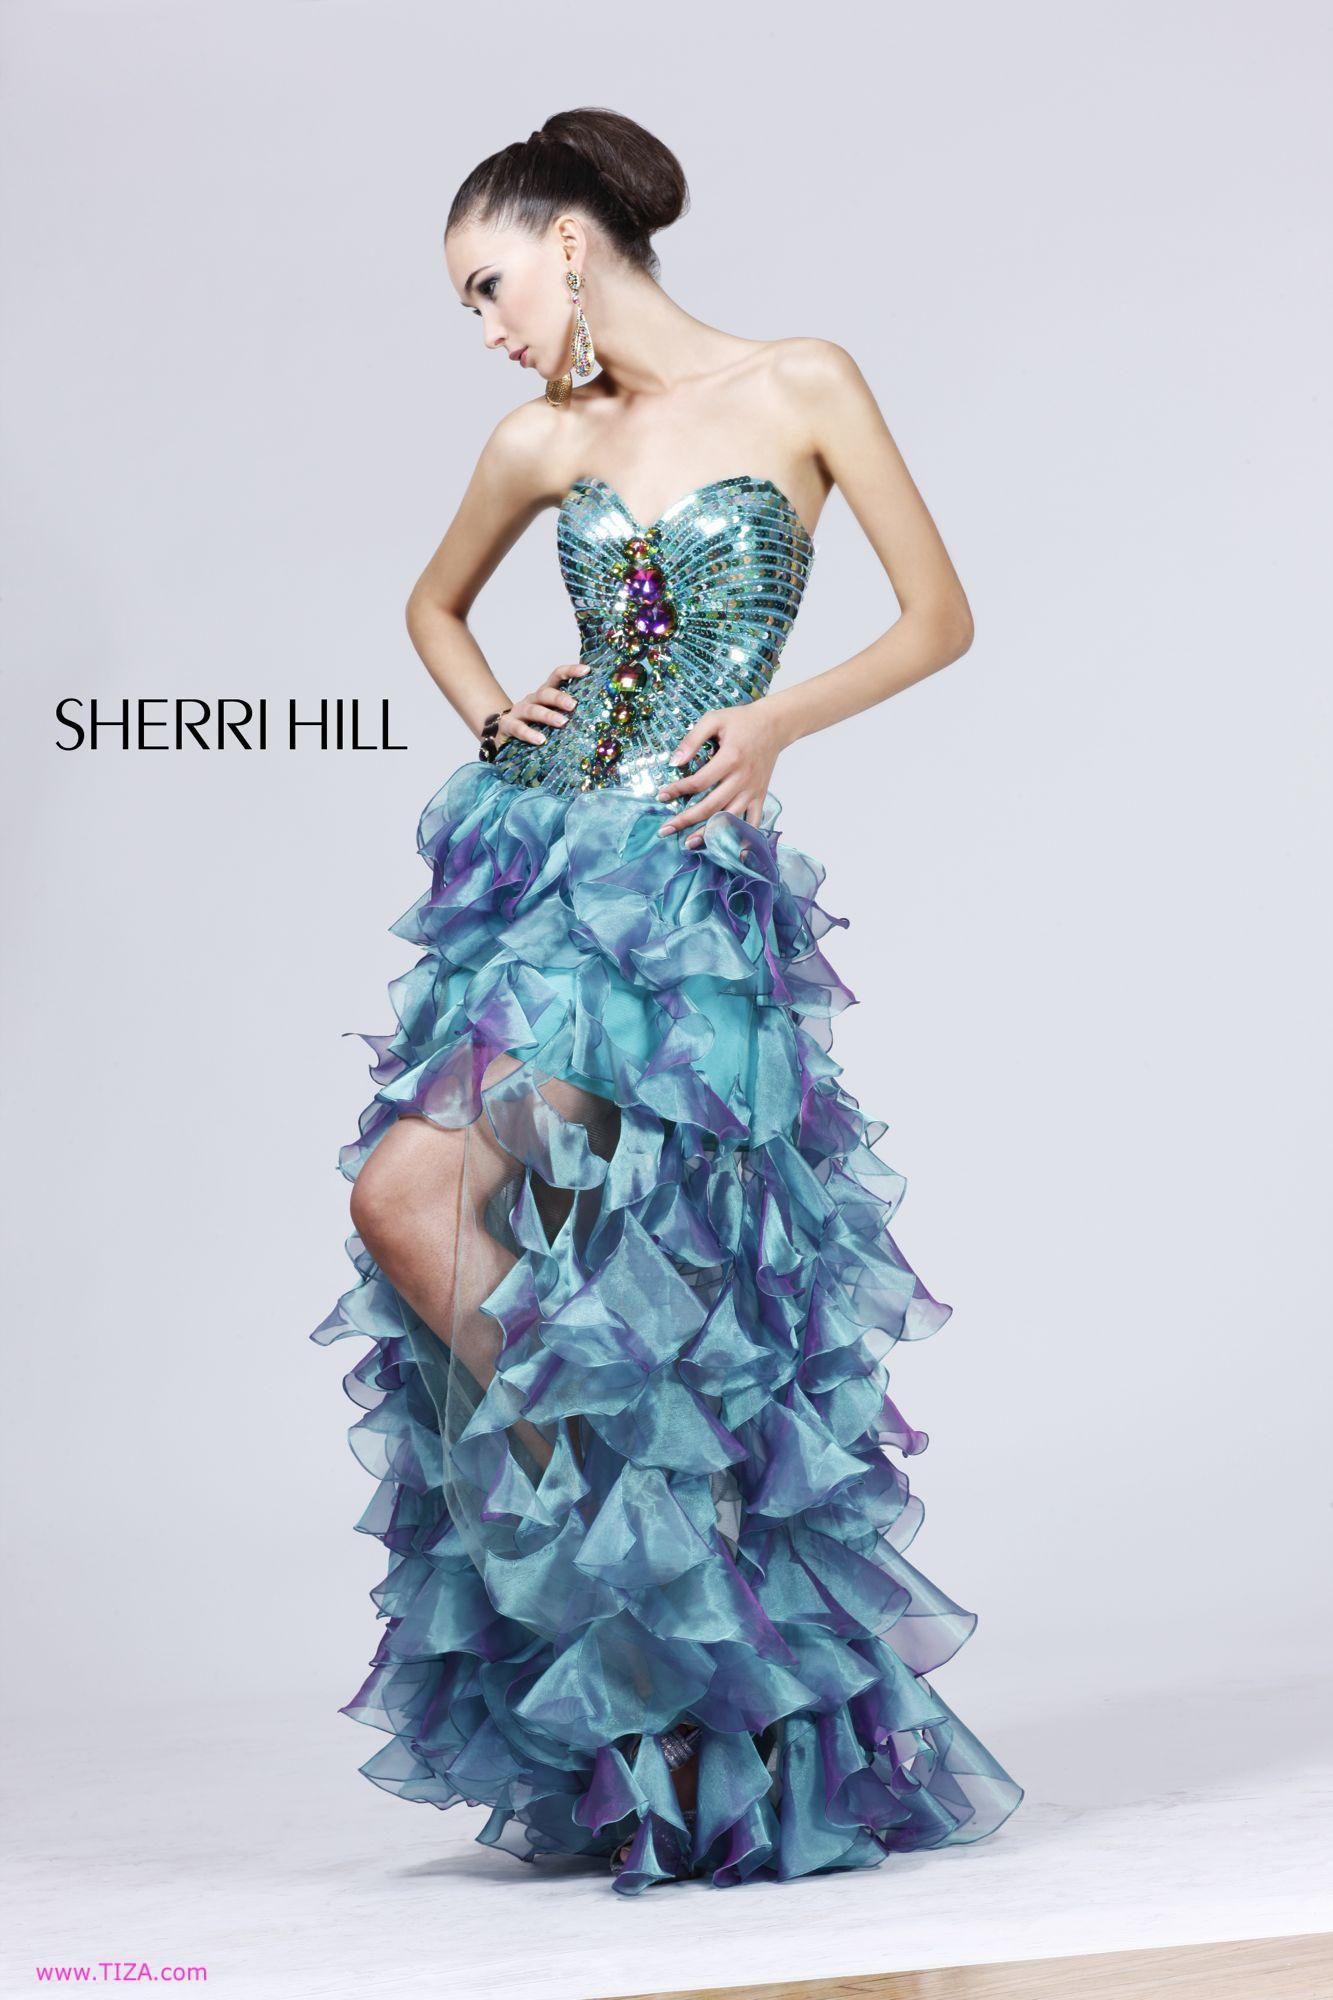 Sherri Hill @A Formal Affair OR shop with us at http://dressshop.aformalaffair.net/